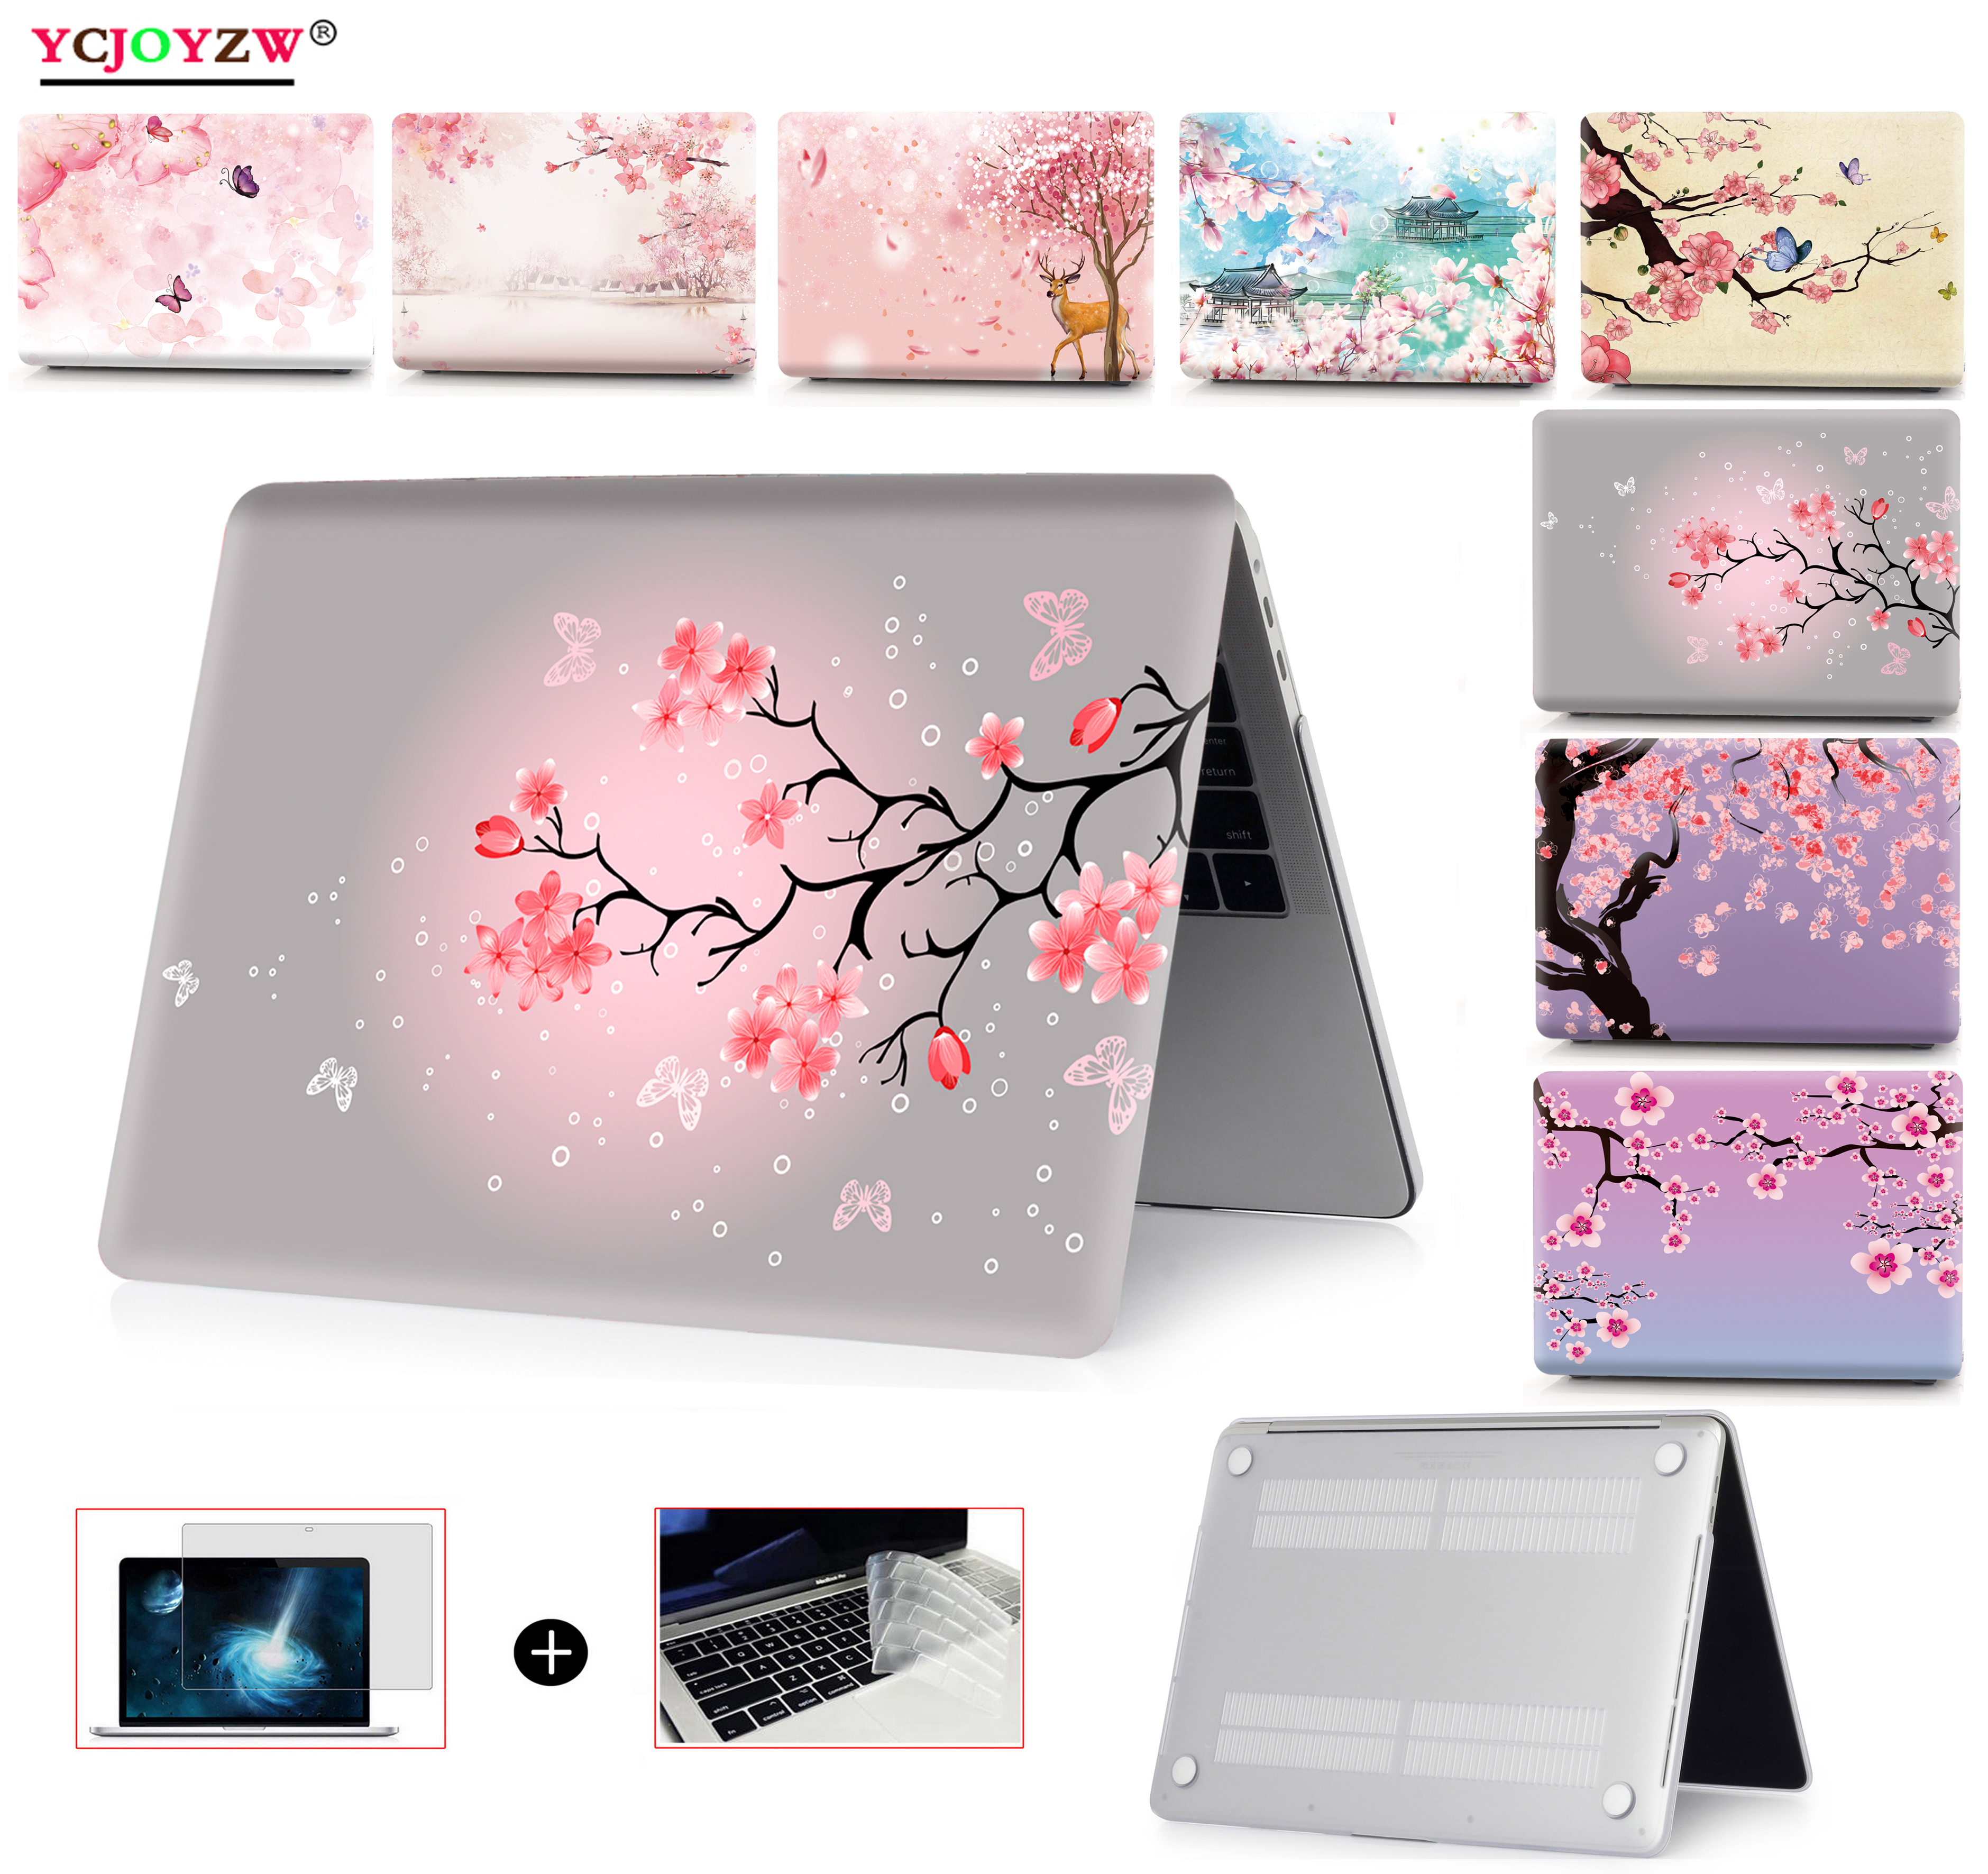 Новый чехол 2020 cherry для MacBook Air 13 A1466 A1932 A2179 Pro Retina 11 12 13 15 16 дюймов A2251 A1706 A1708 A1989 A2159